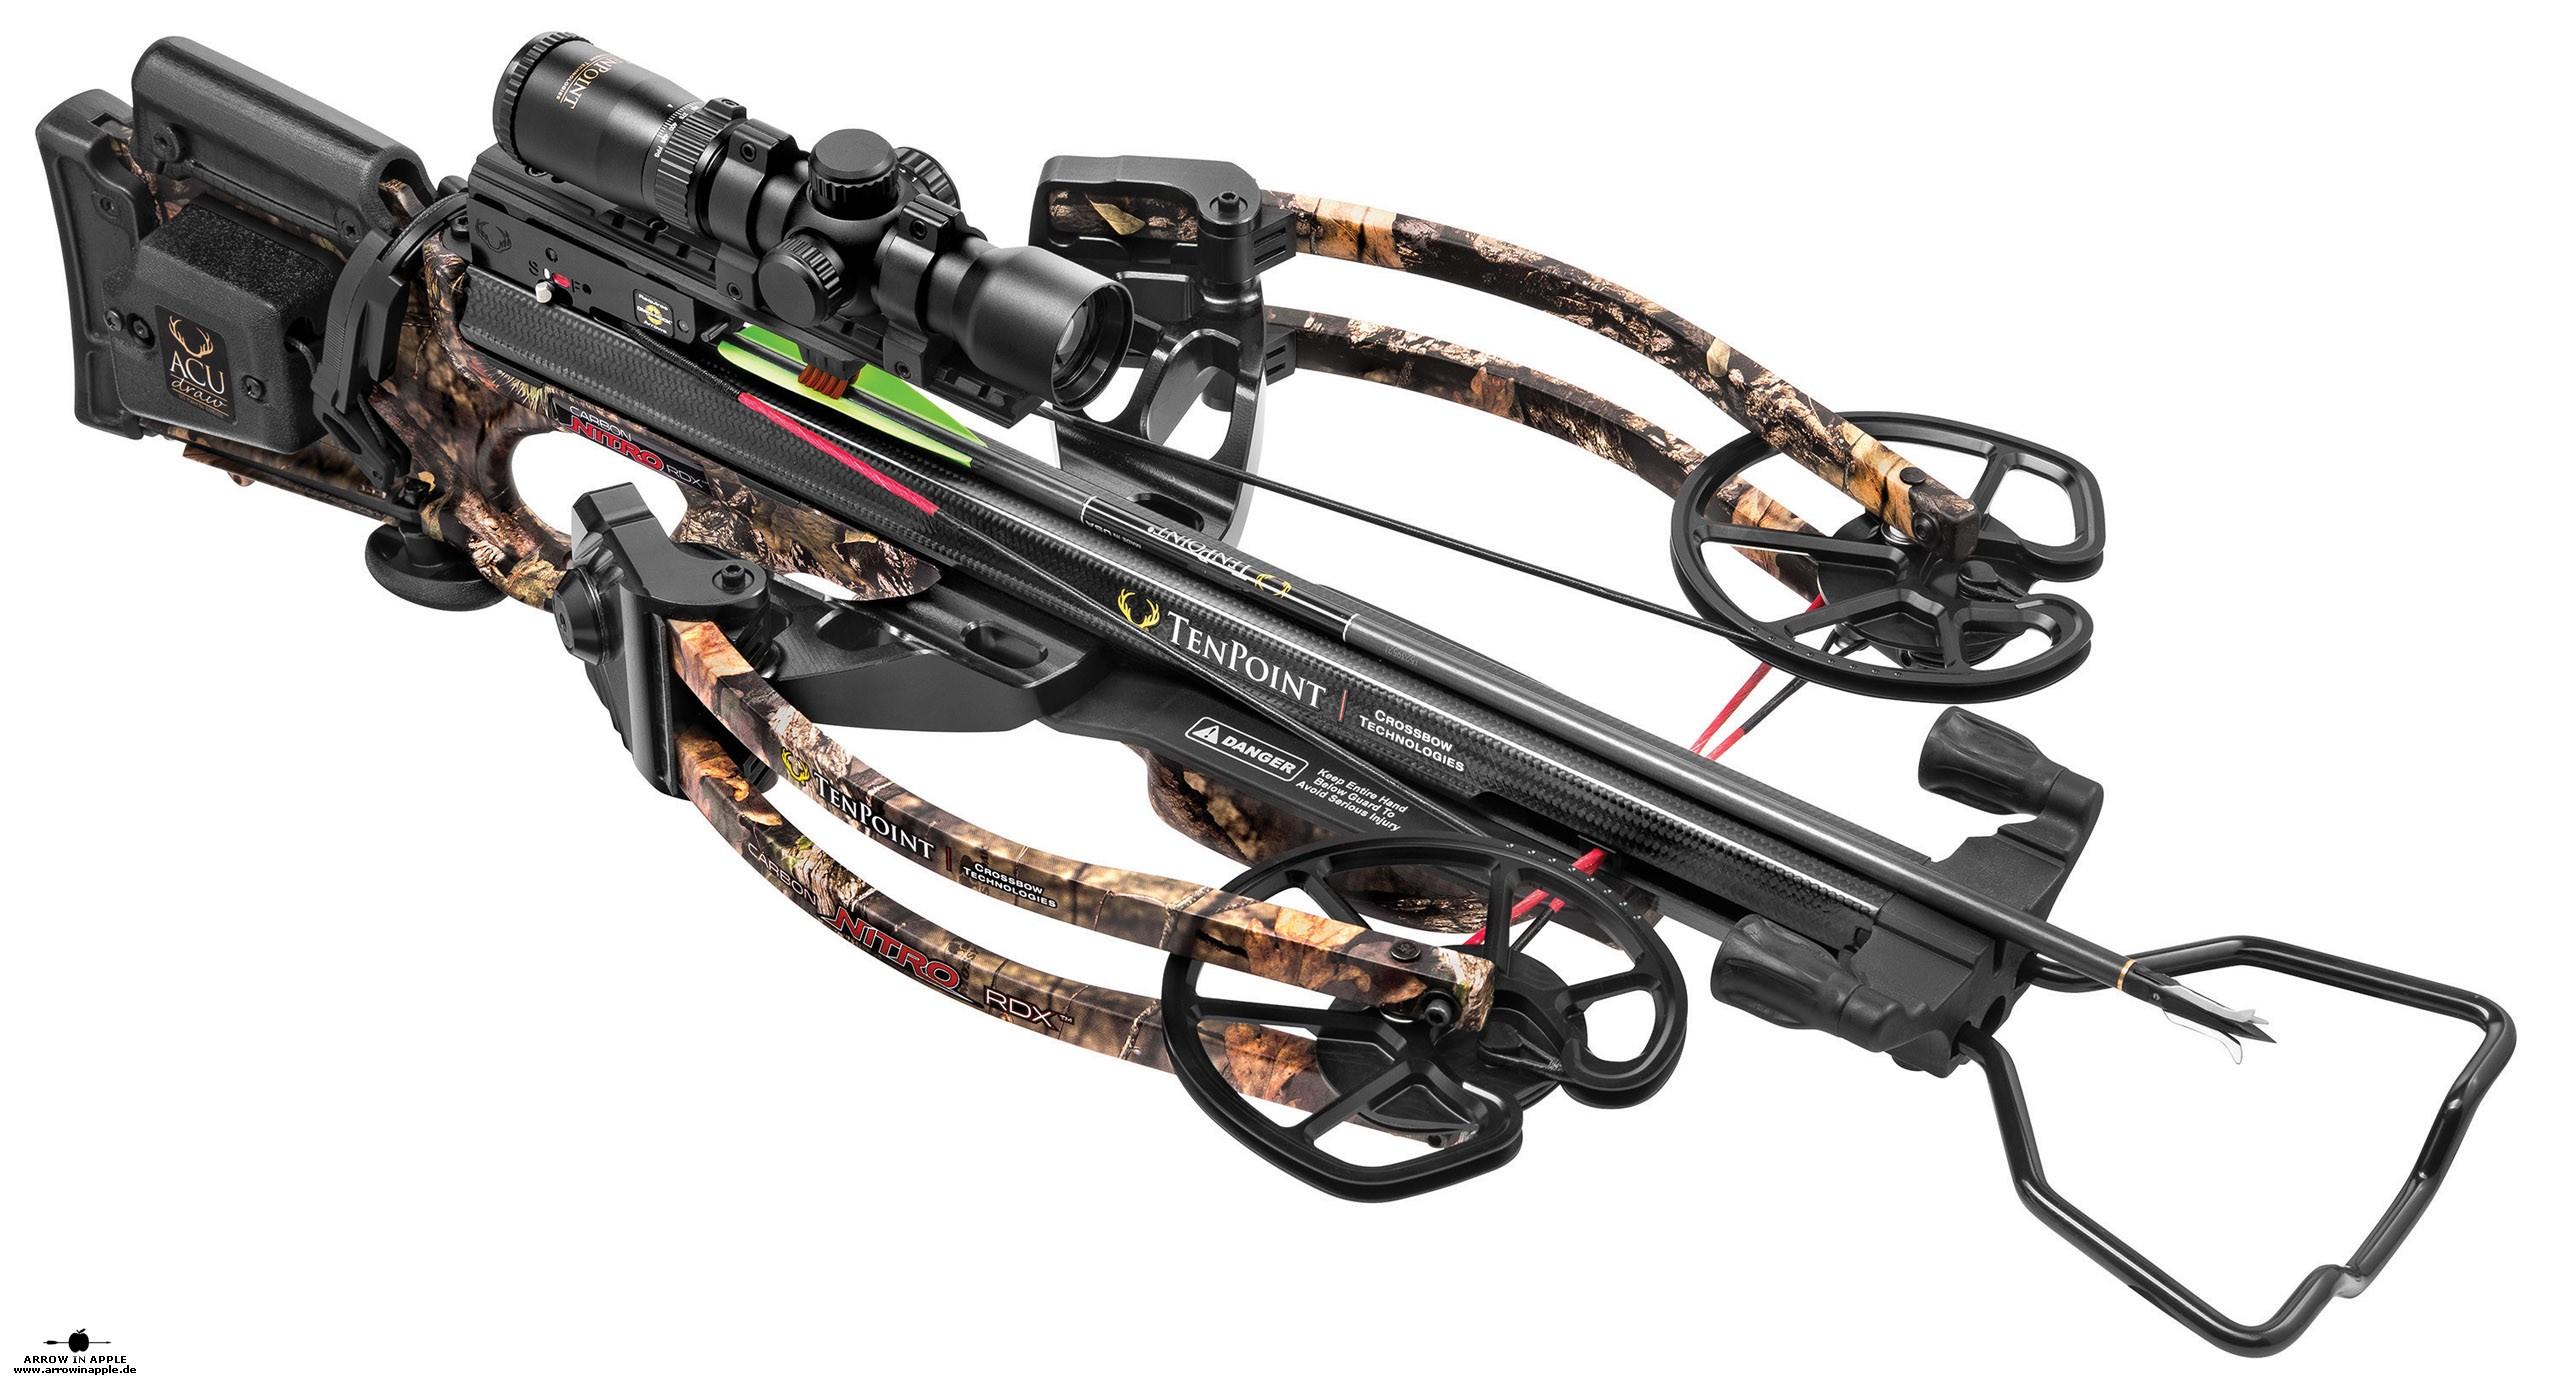 rdx crossbow nitro carbon tenpoint armbrust der arrow